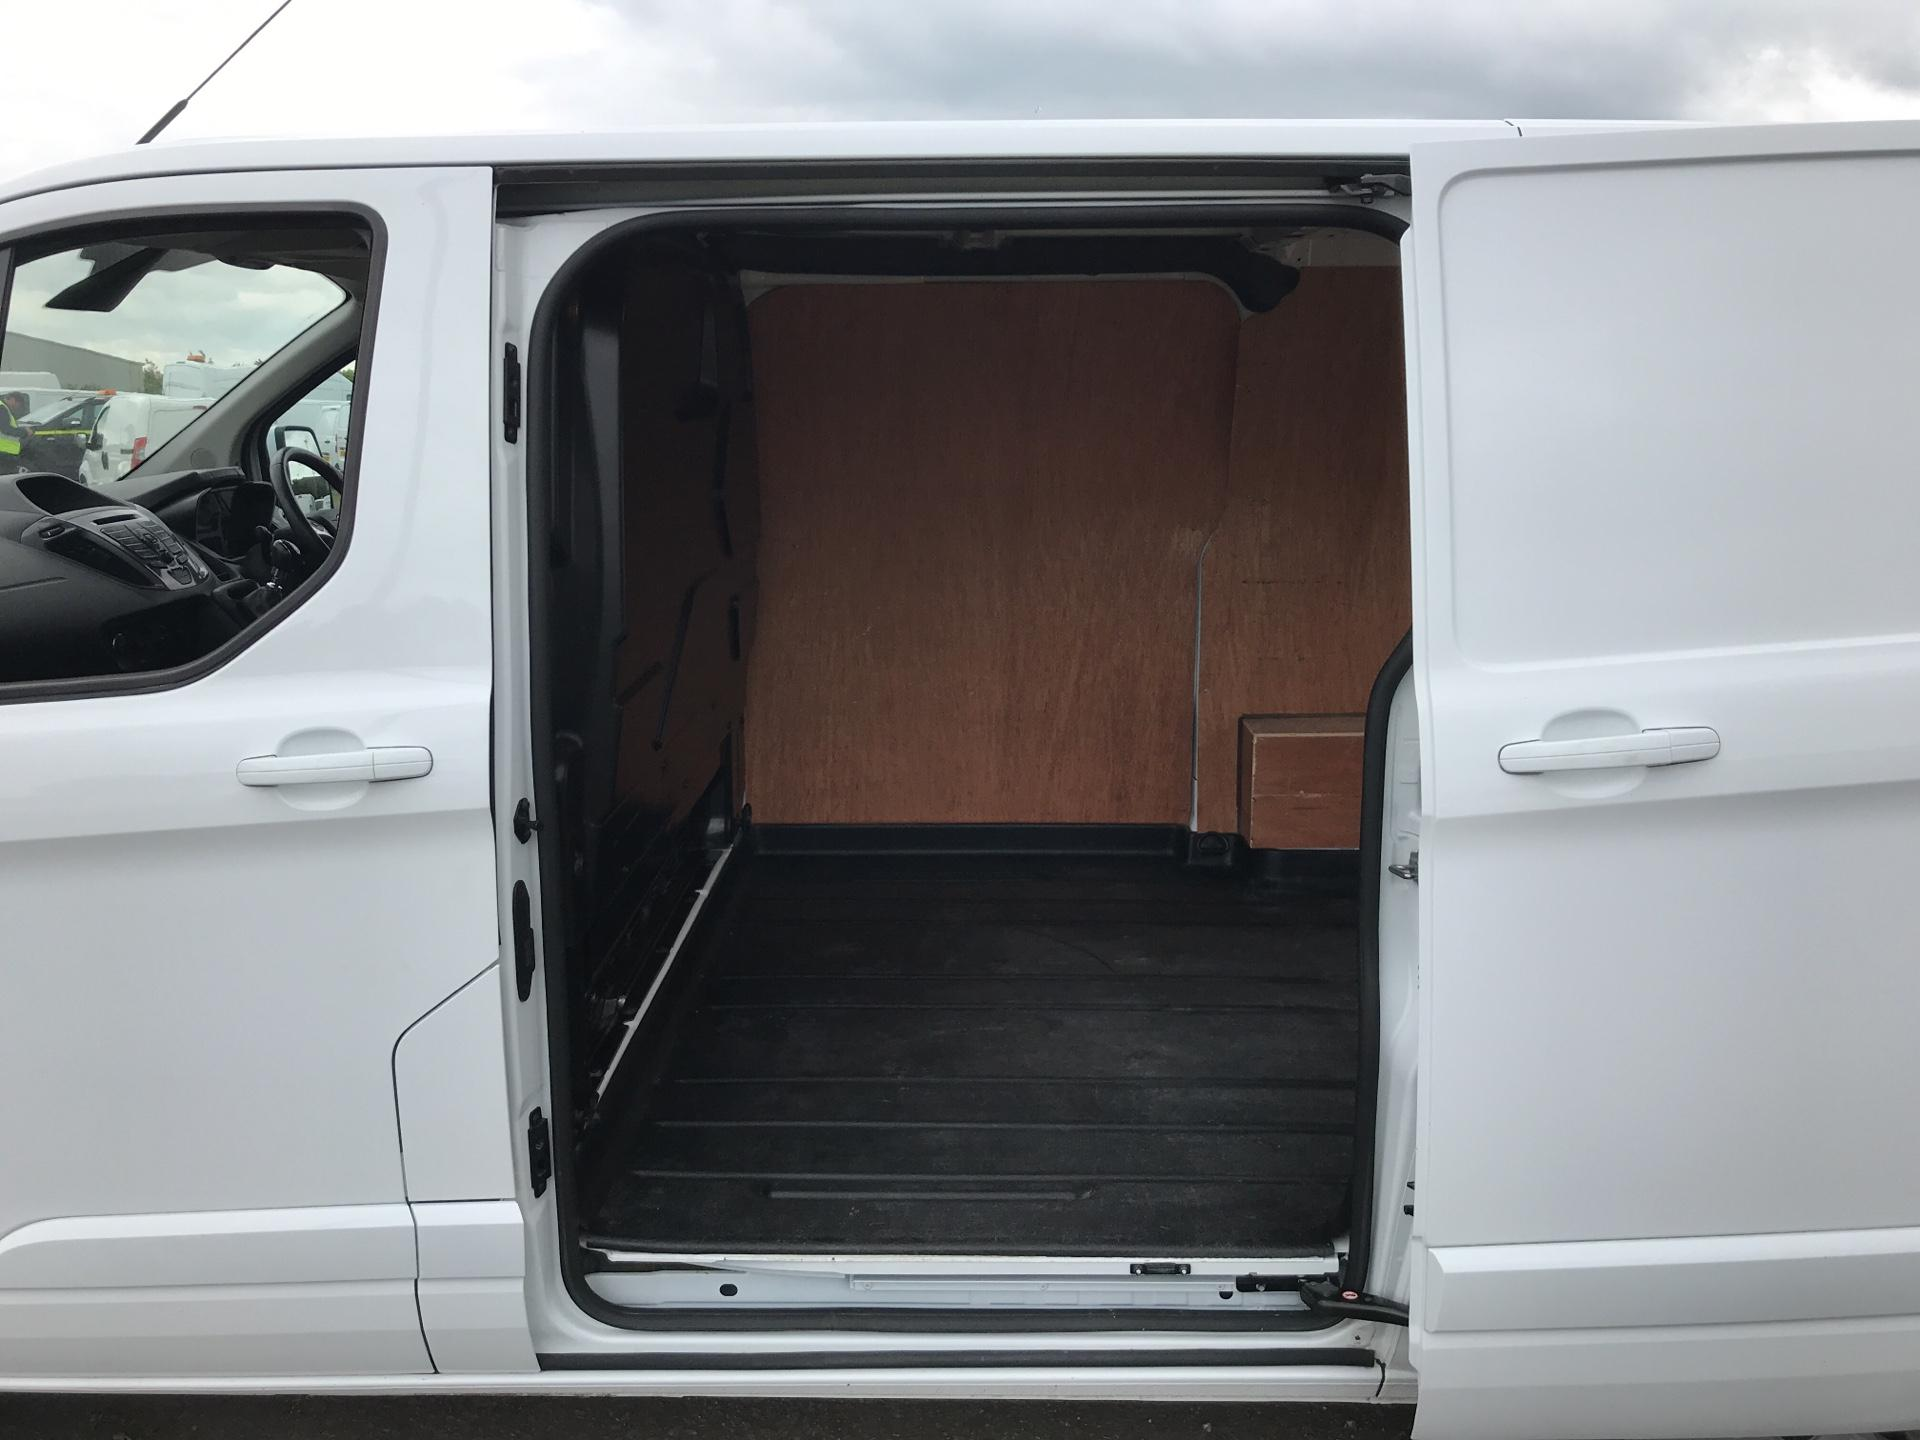 2016 Ford Transit Custom 290 L1 DIESEL FWD 2.2 TDCI 125 PS LOW ROOF LIMITED VAN EURO 5 (MK16WXV) Image 16